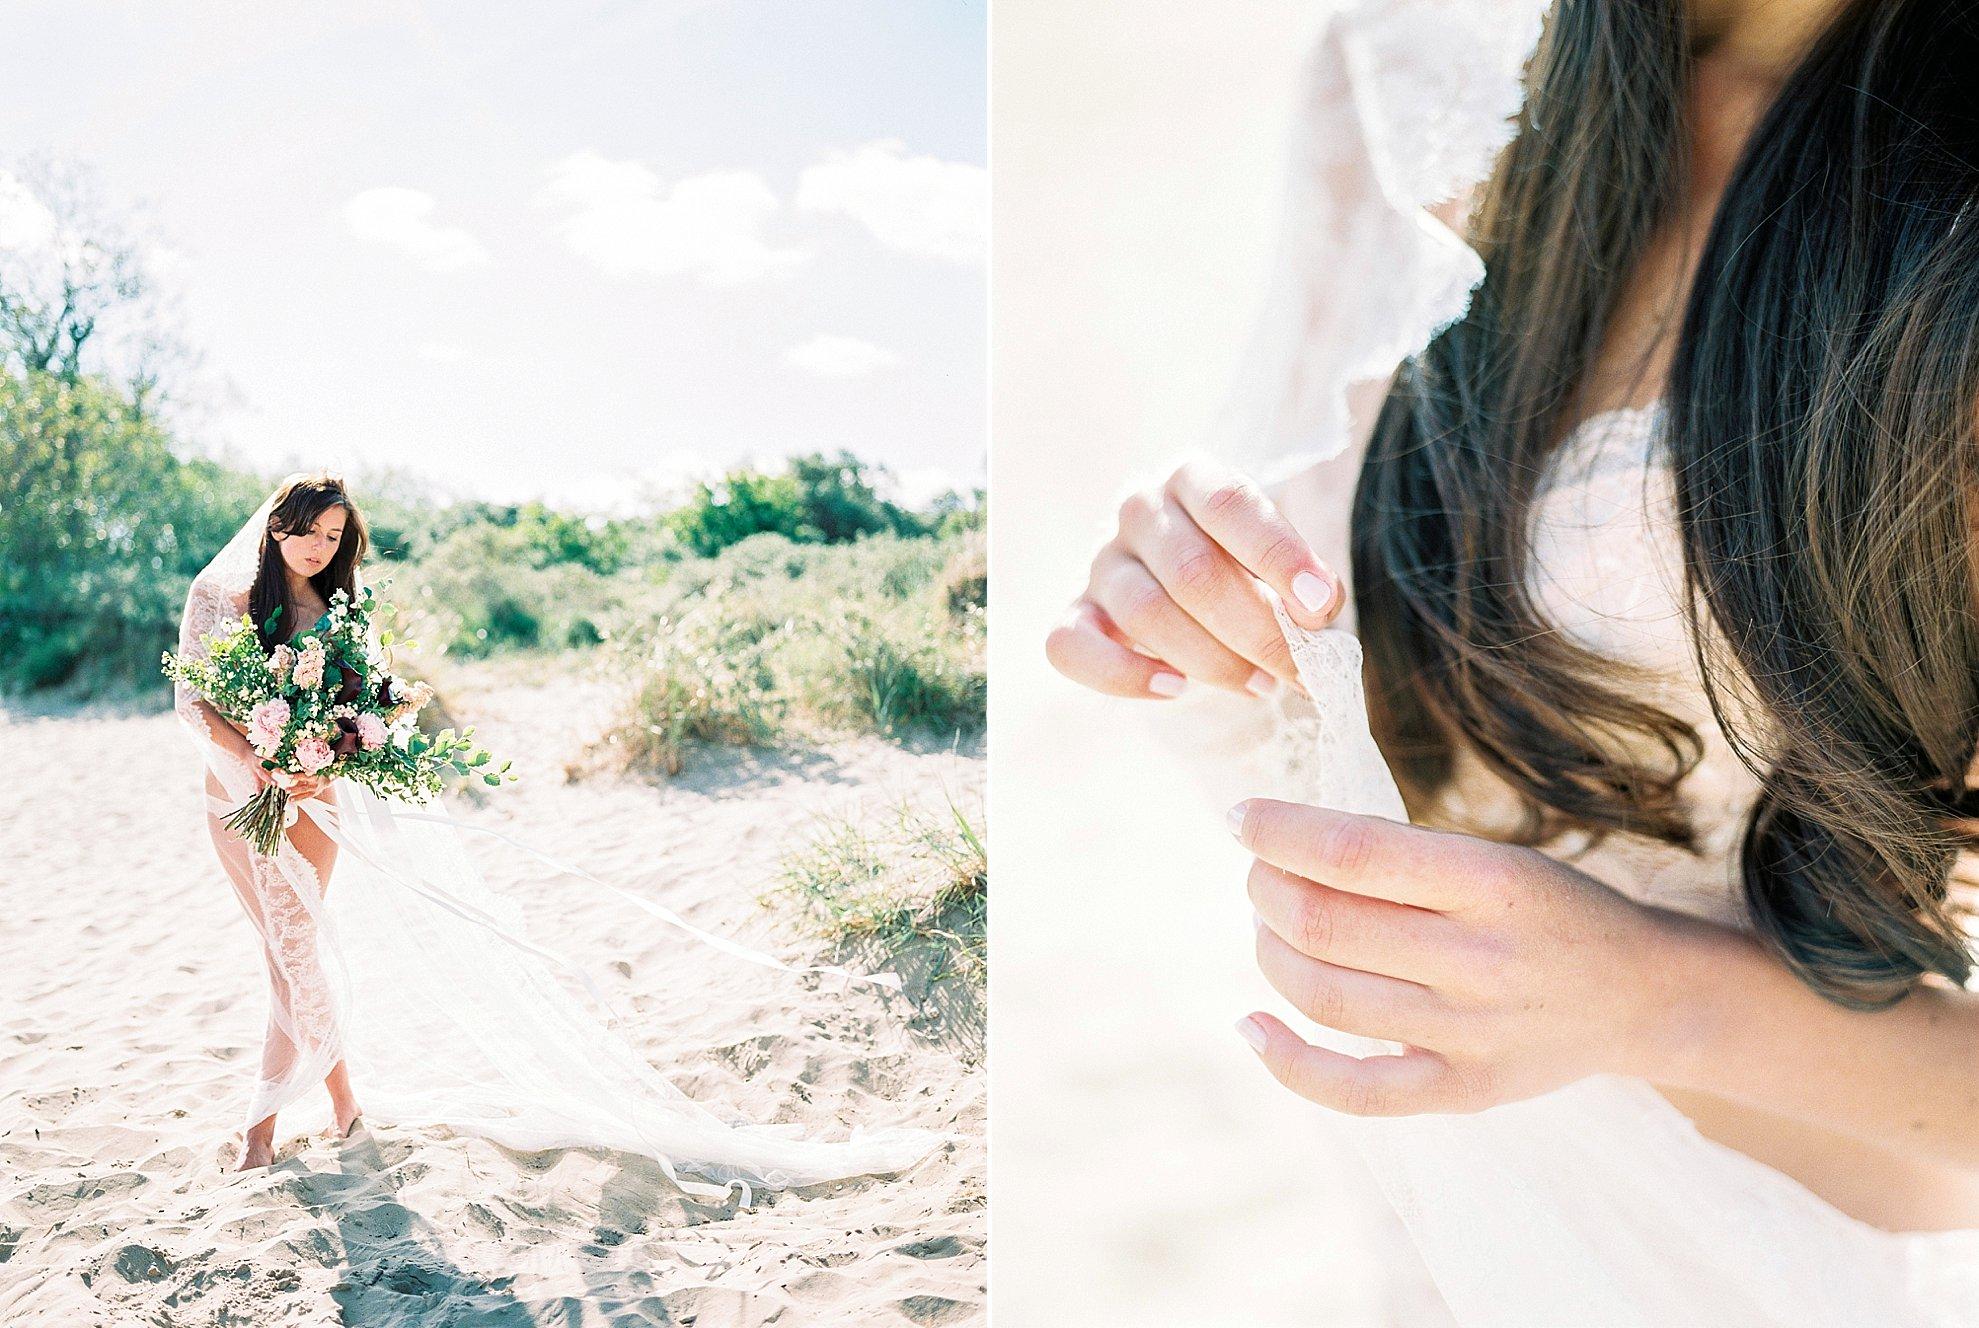 Amanda-Drost-Photography-Fine-Art-Nederland00015.jpg